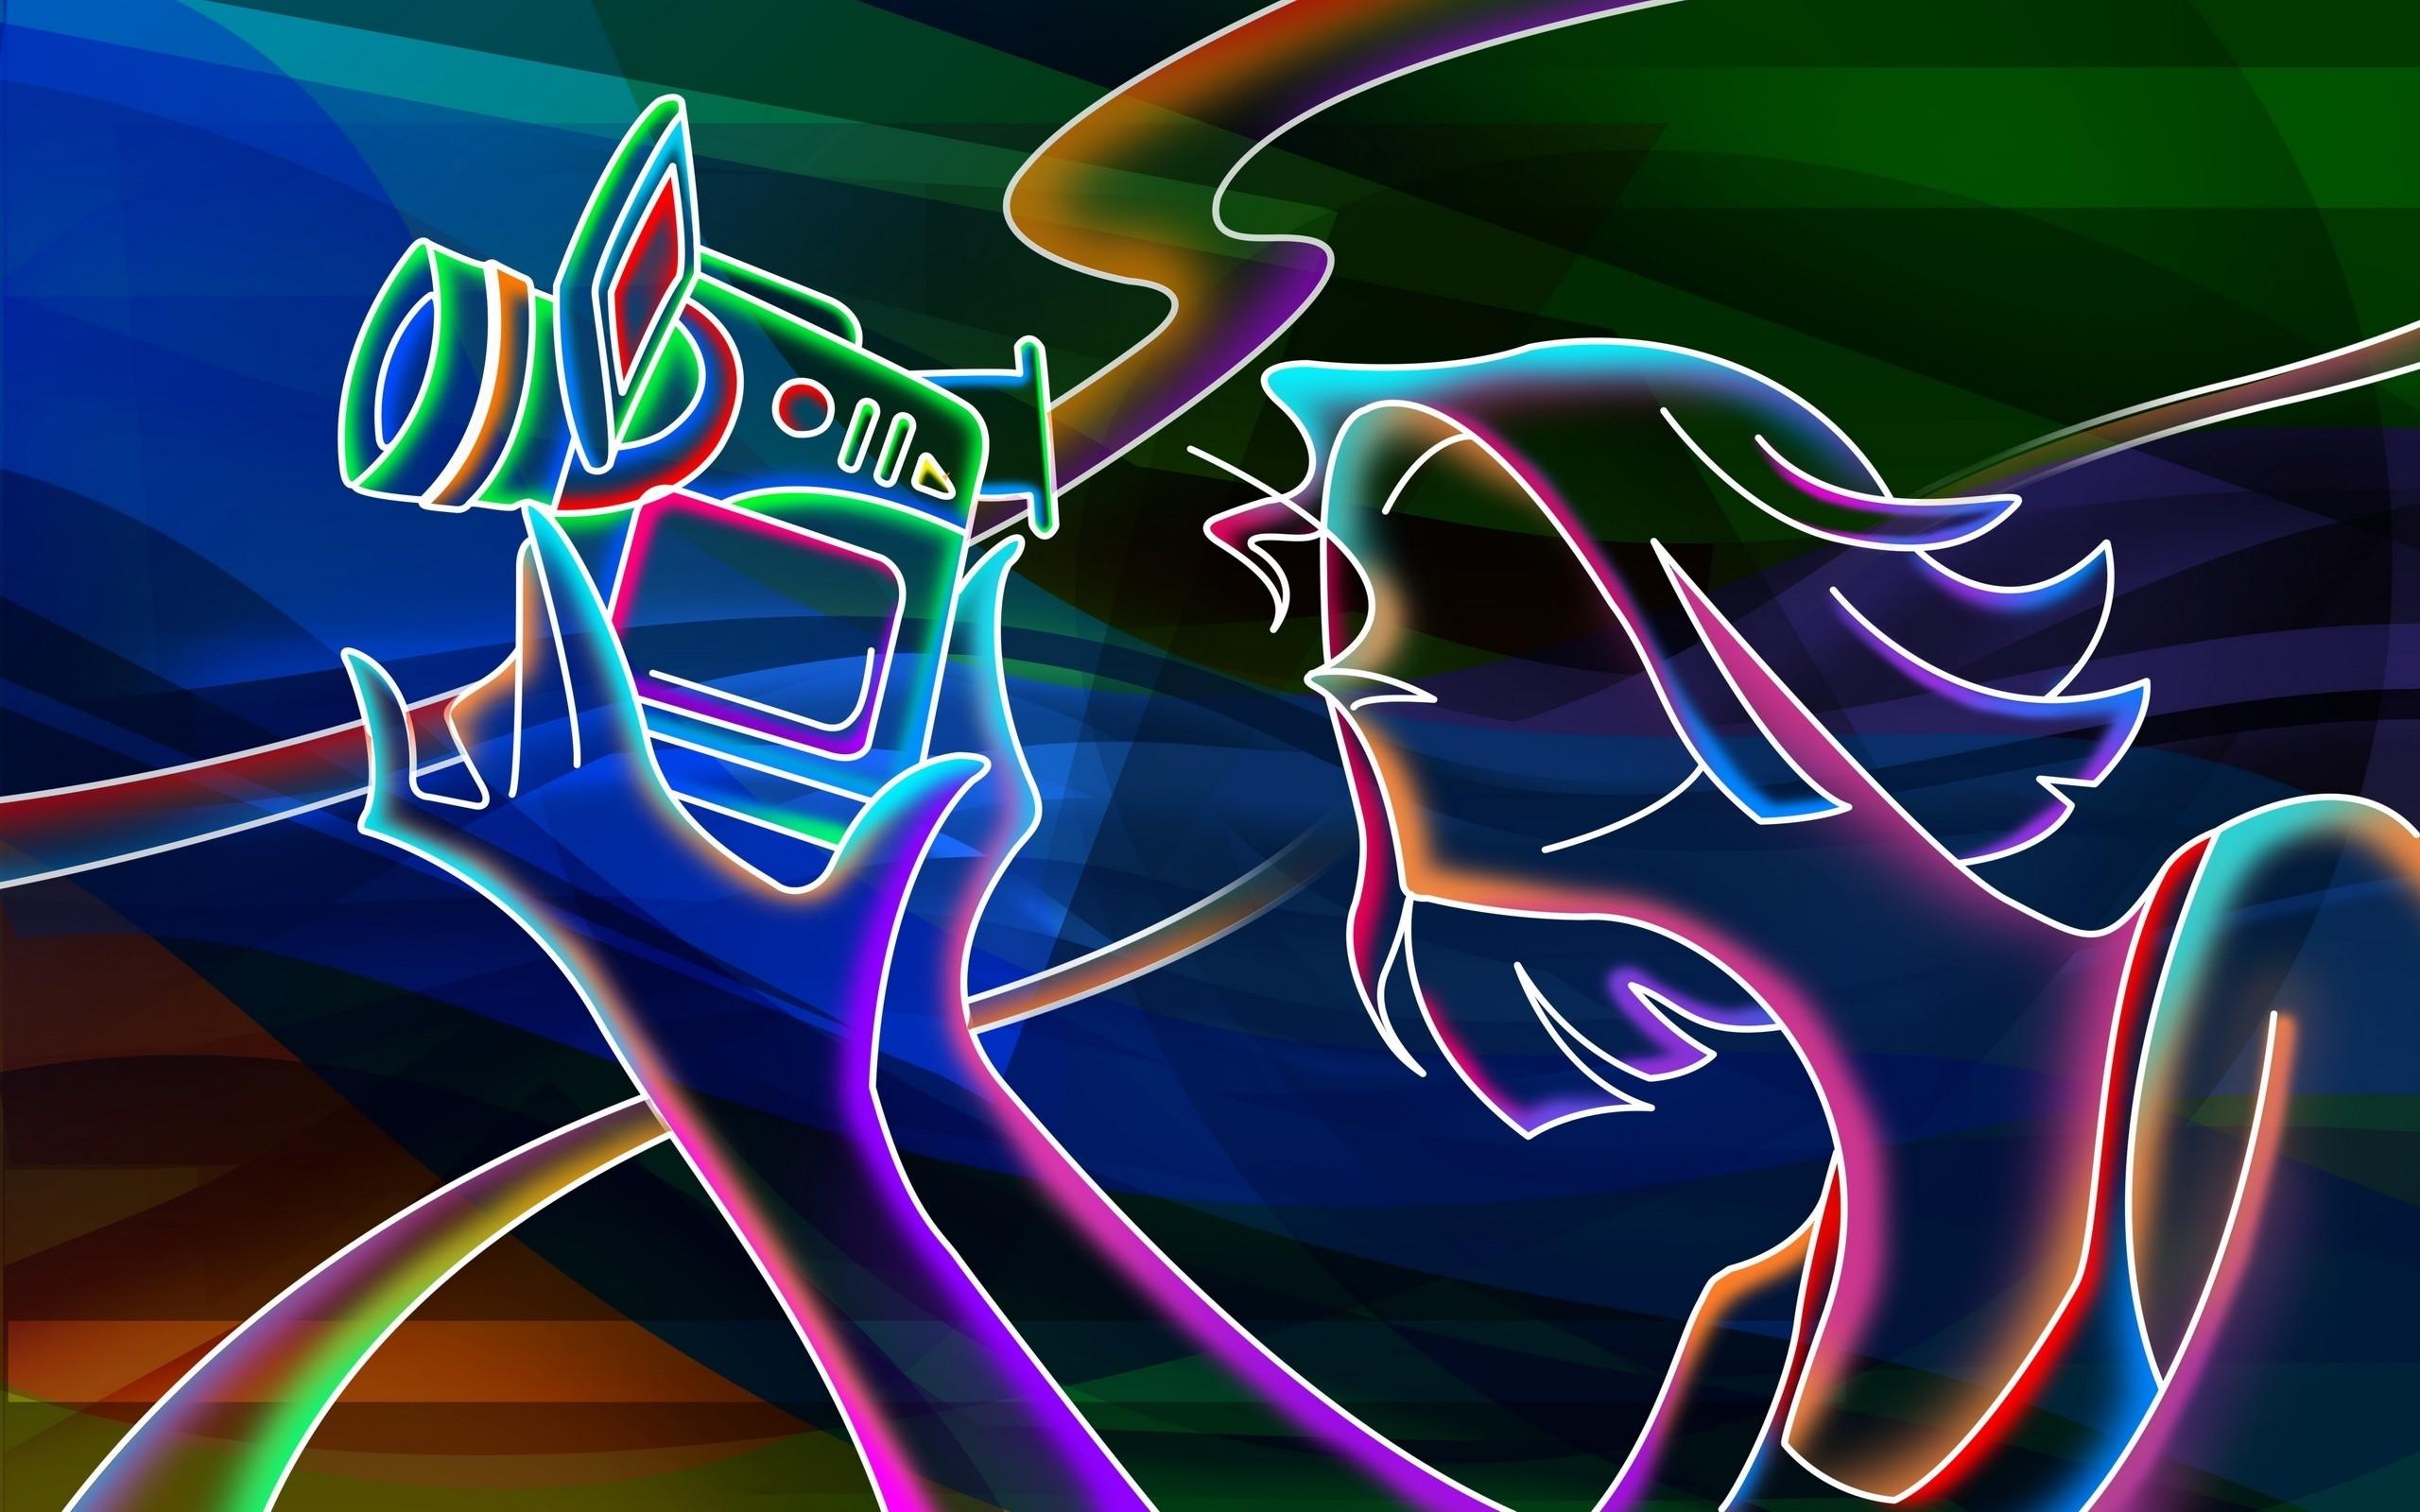 artistic neon Wallpaper Backgrounds